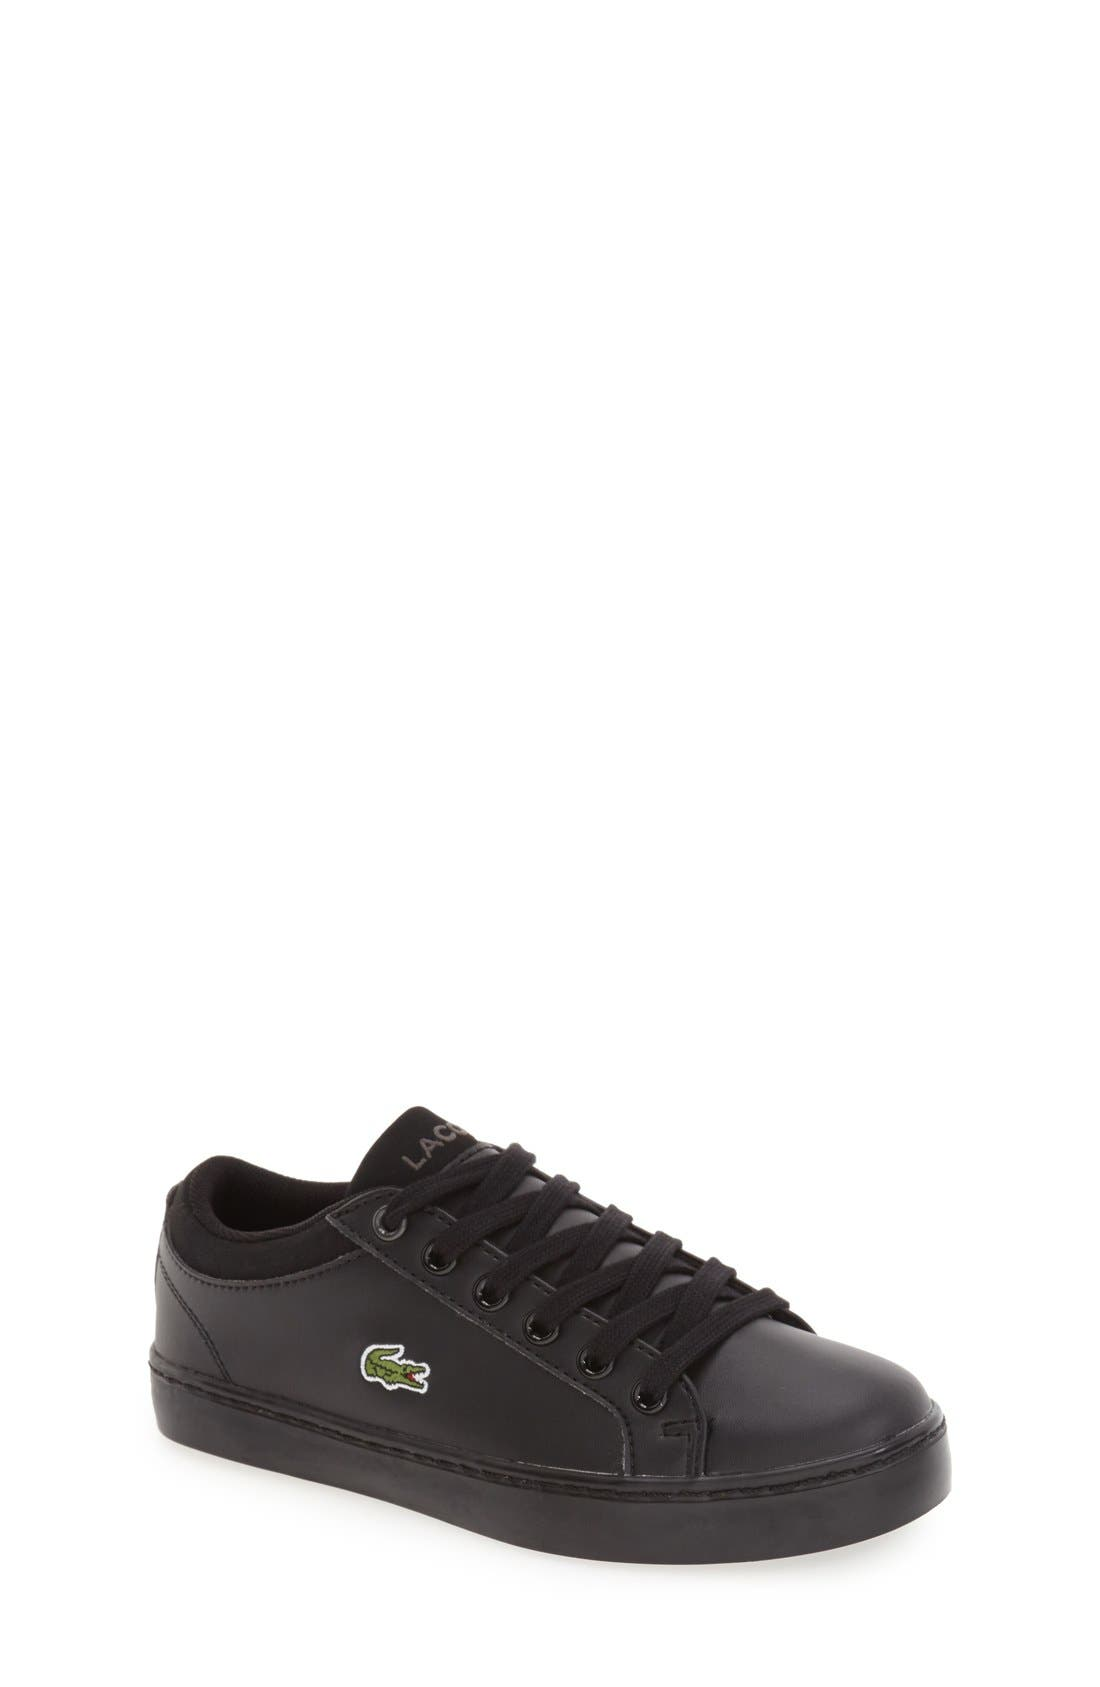 Alternate Image 1 Selected - Lacoste 'Straightset' Sneaker (Toddler, Little Kid & Big Kid)